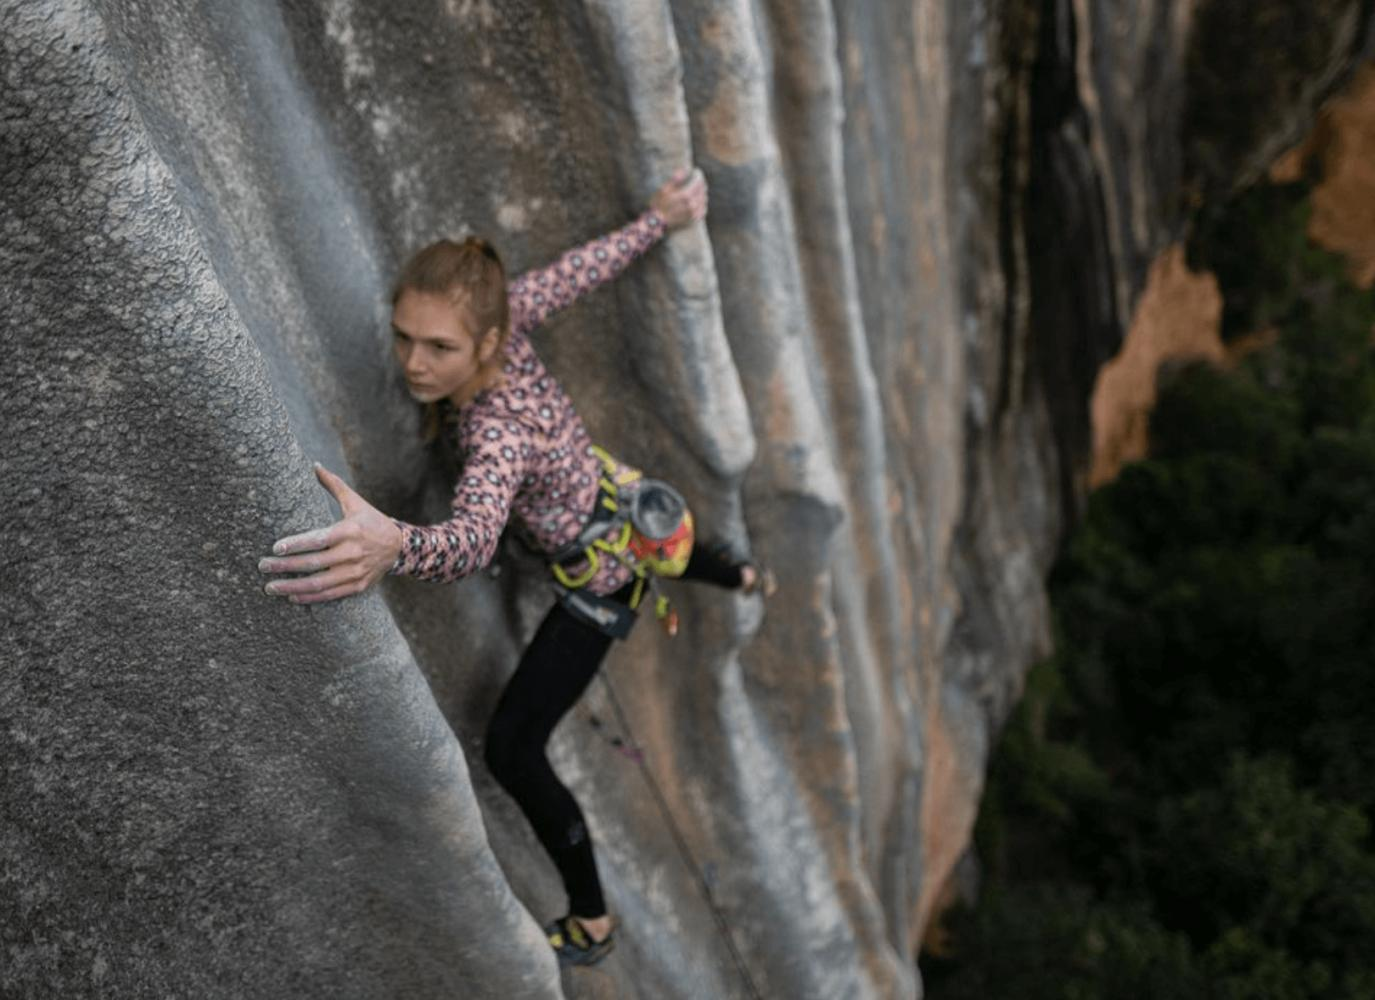 Eliška Adamovská pic @climberbehindlens